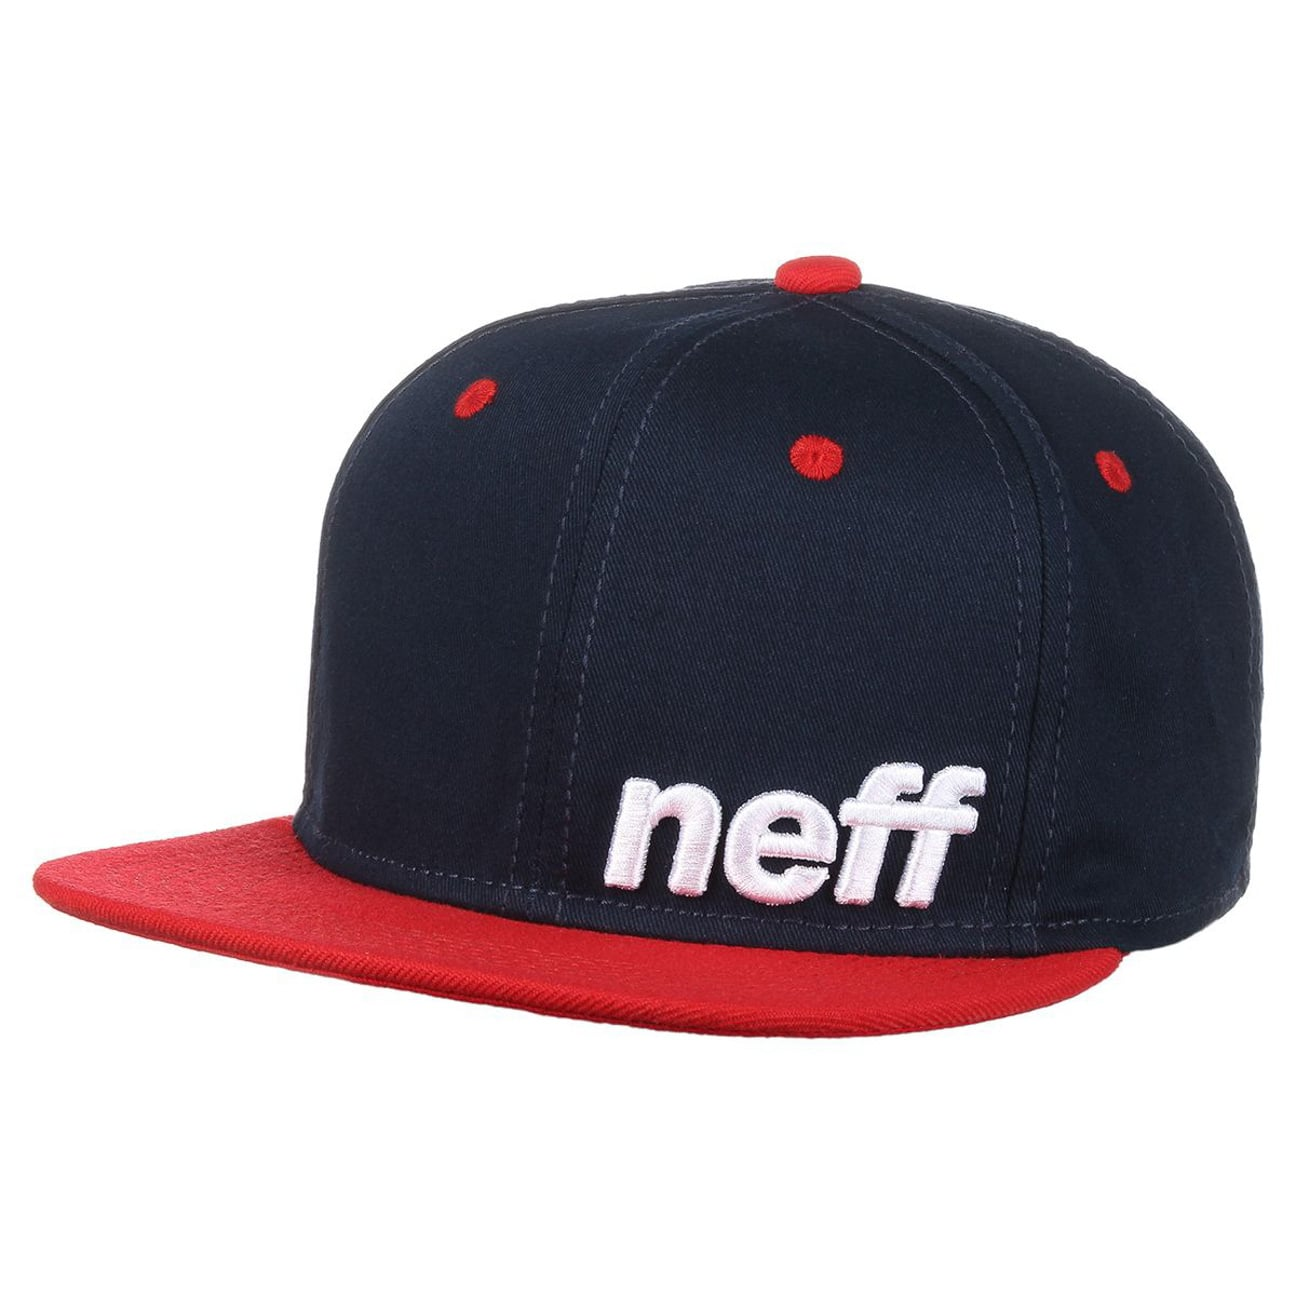 daily cotton snapback cap by neff eur 24 90 hats caps beanies shop online. Black Bedroom Furniture Sets. Home Design Ideas